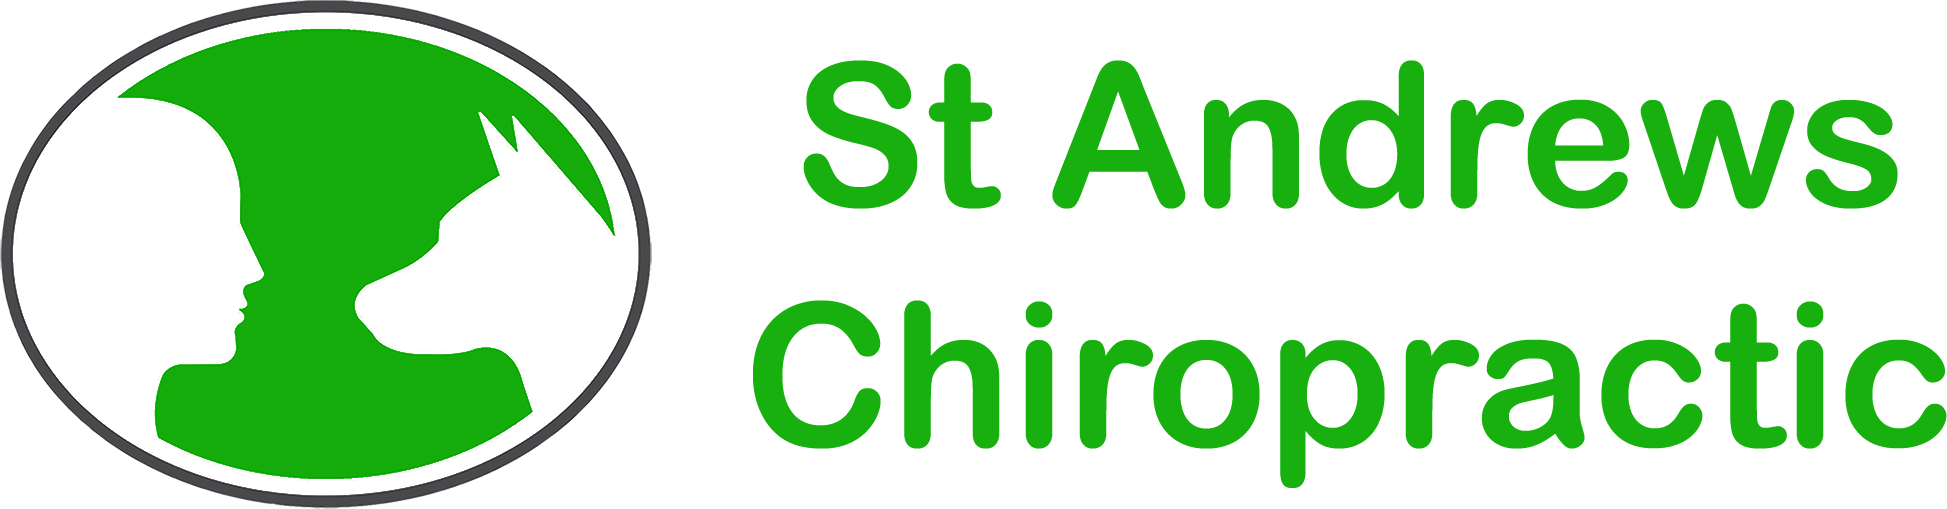 St Andrews Chiropractic